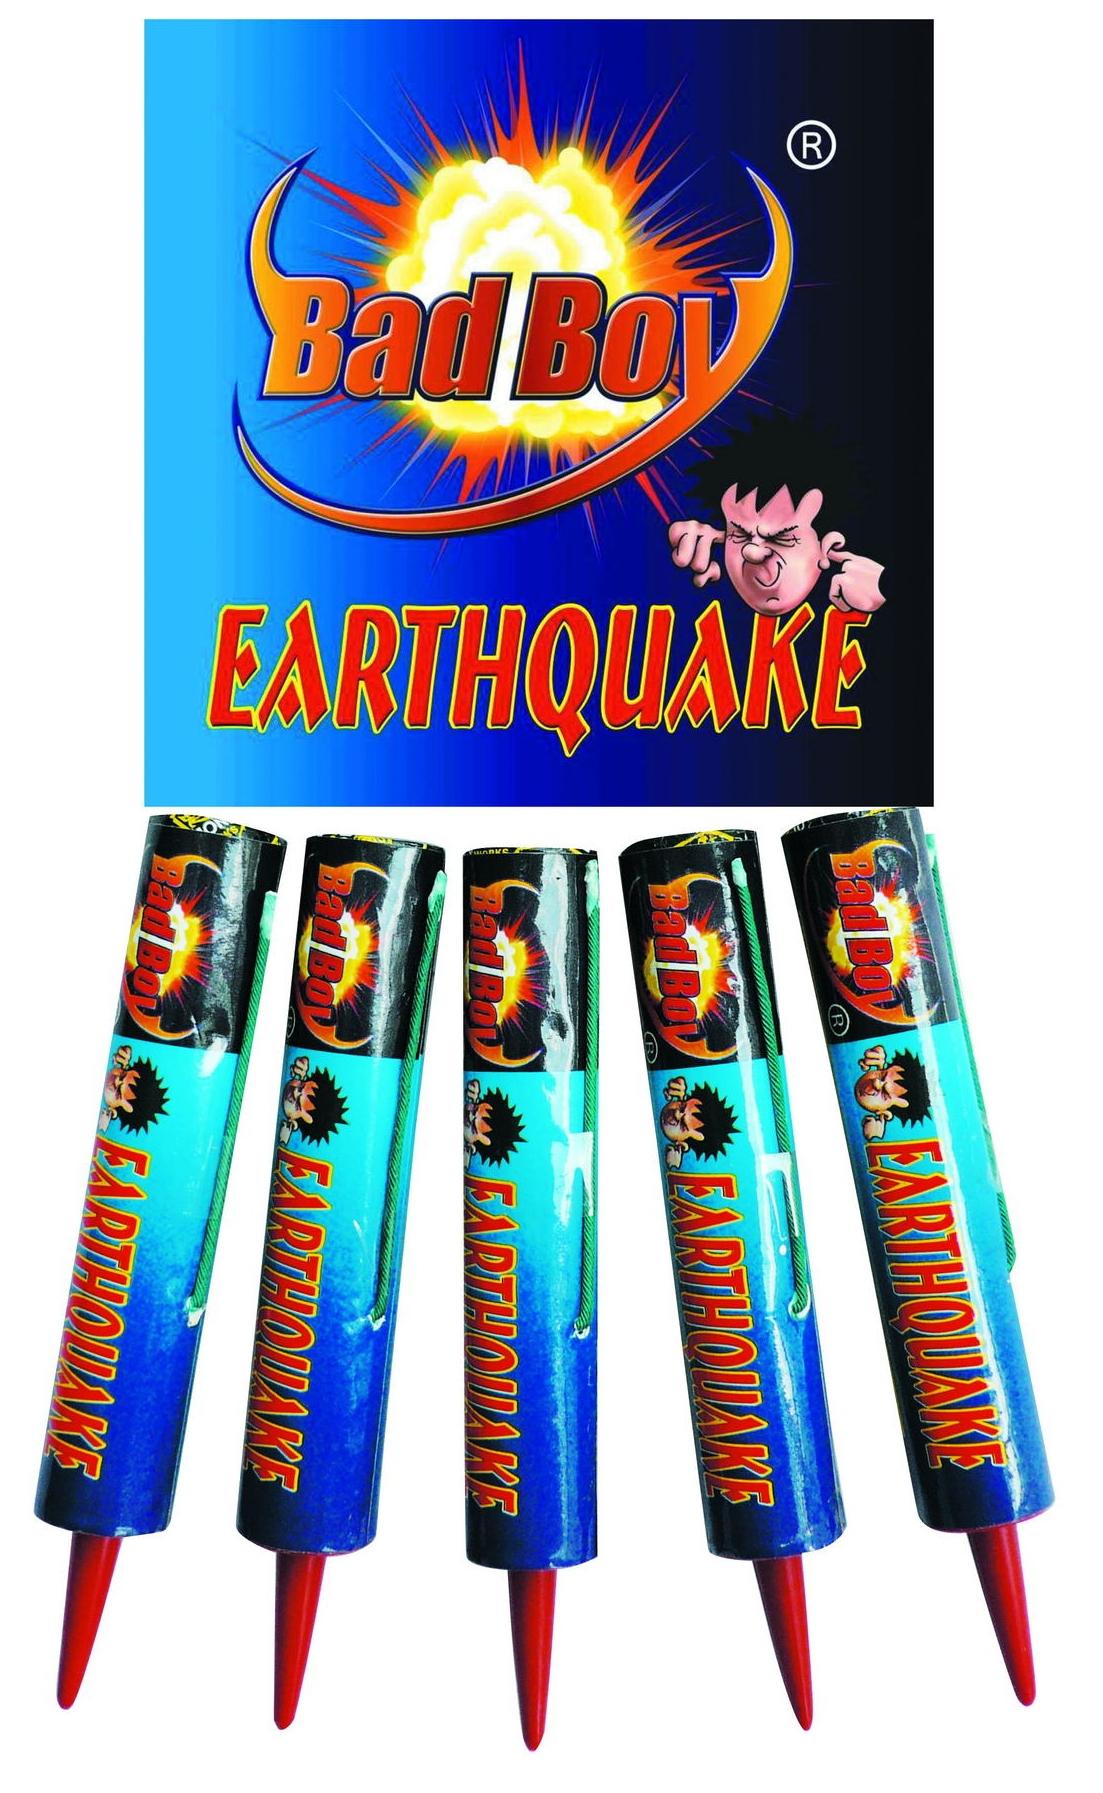 Earthquake 5pk - RRP £7.00